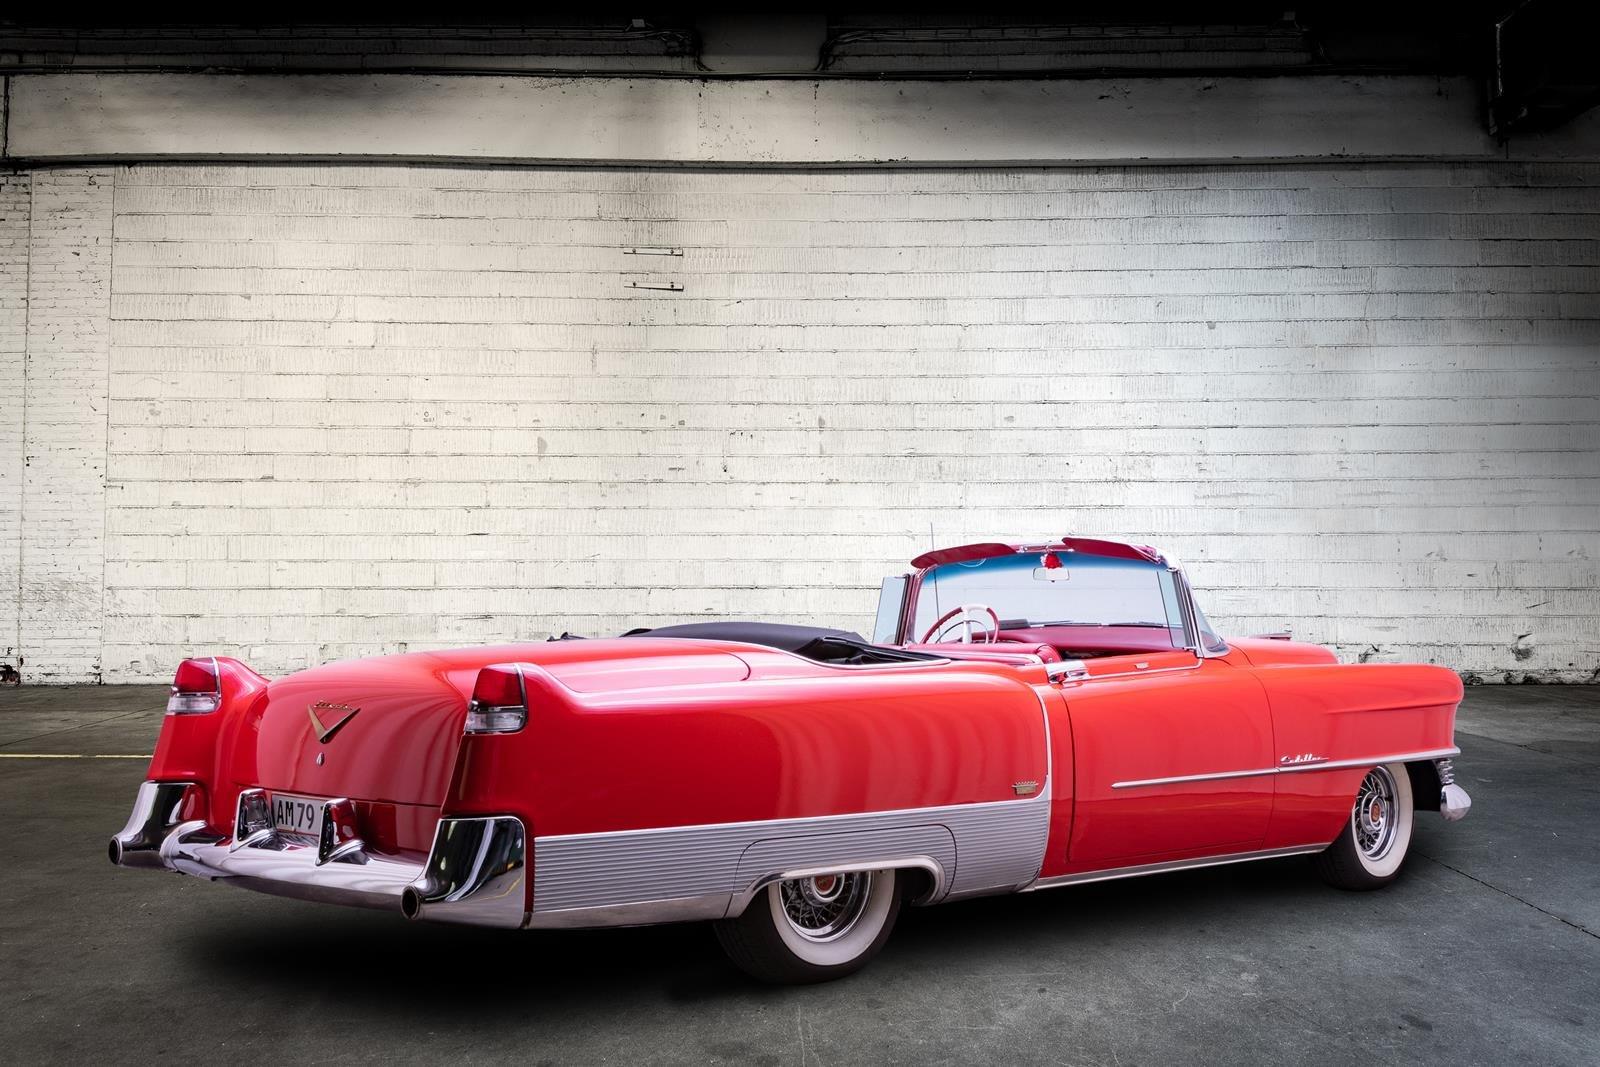 Cadillac Eldorado Convertible 6,5L 1954 For Sale (picture 2 of 6)